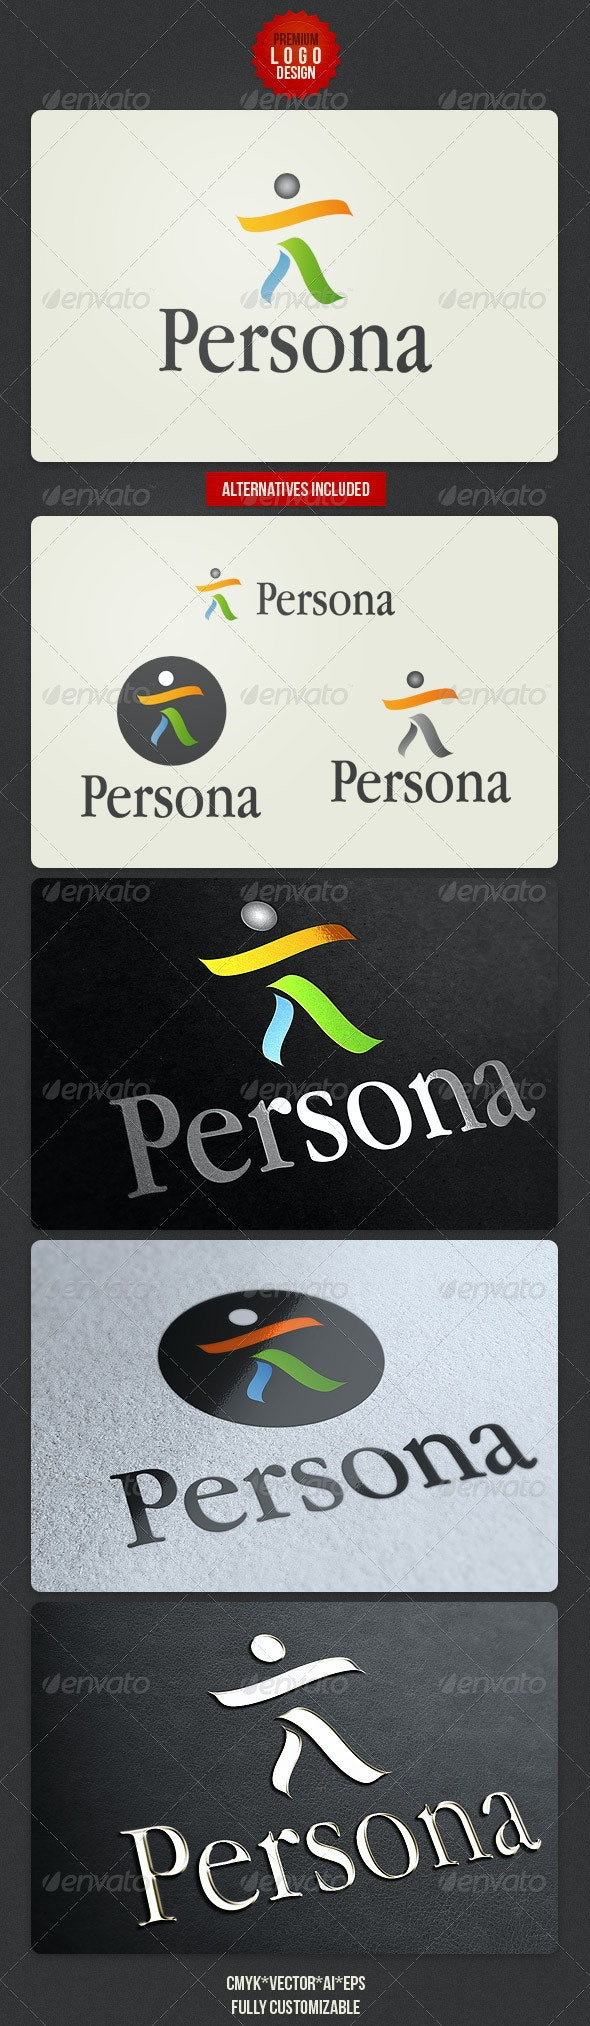 Persona Clean Logo Design - Symbols Logo Templates